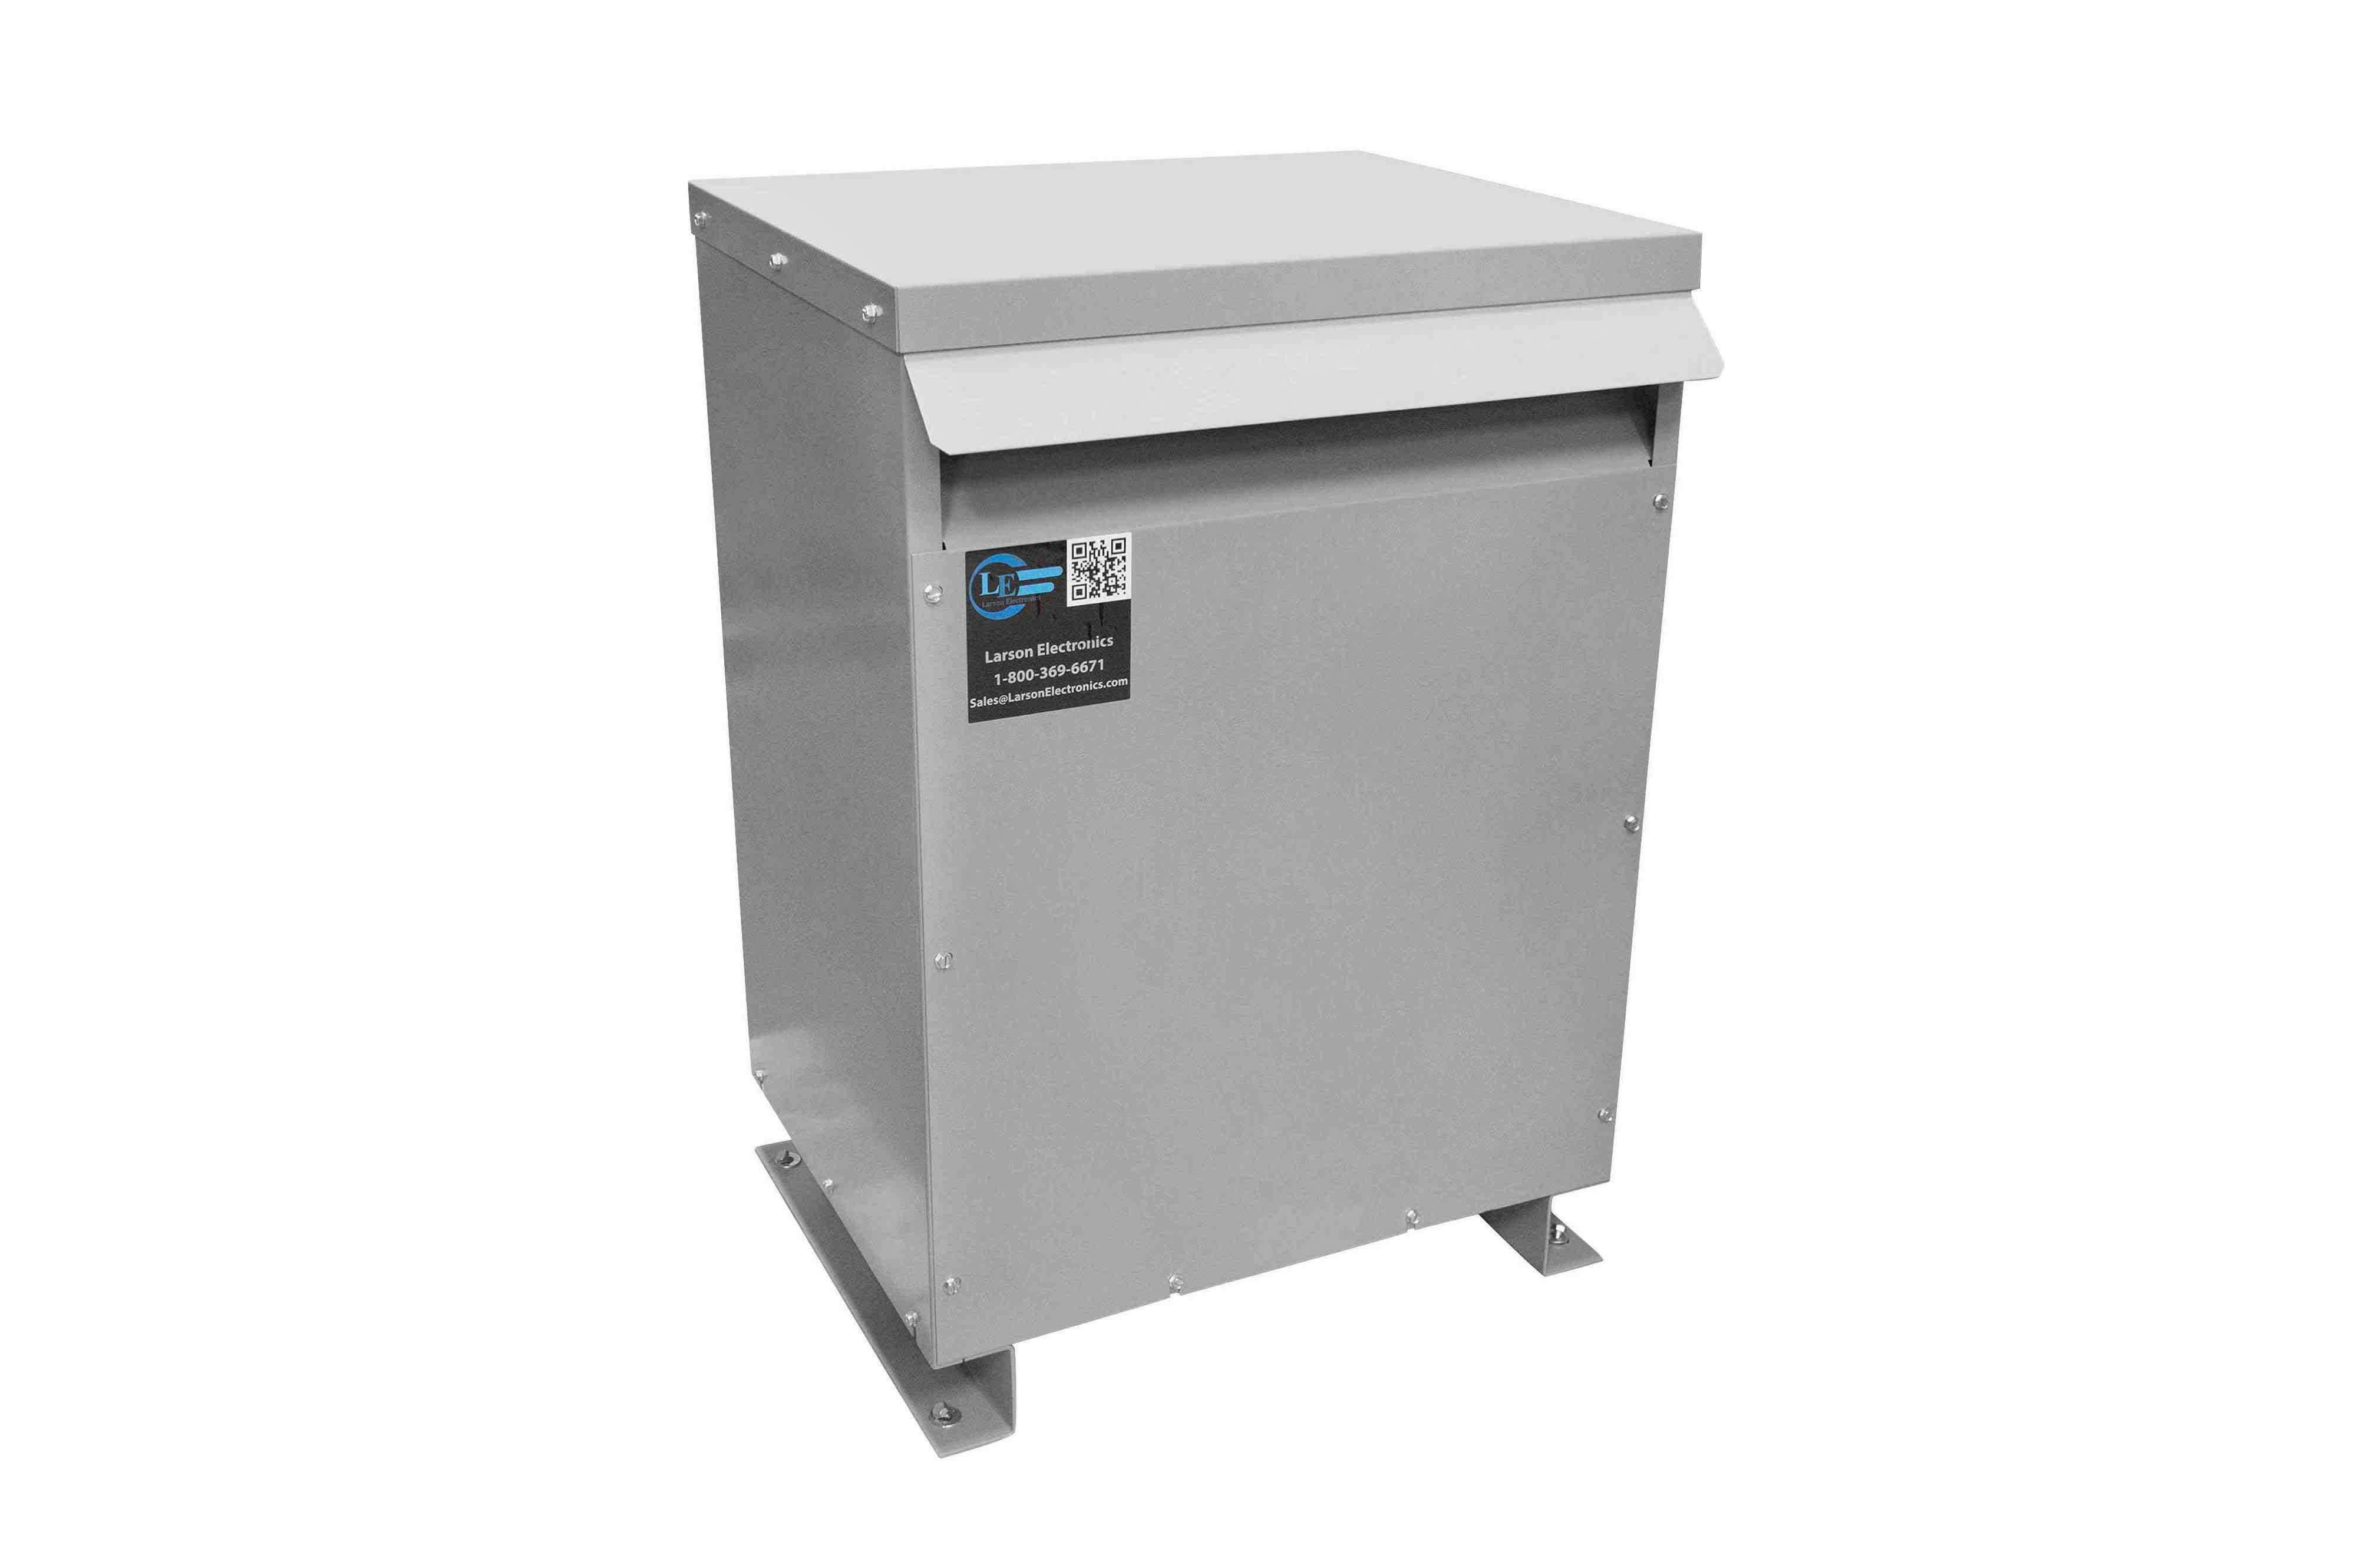 1000 kVA 3PH Isolation Transformer, 220V Wye Primary, 480V Delta Secondary, N3R, Ventilated, 60 Hz